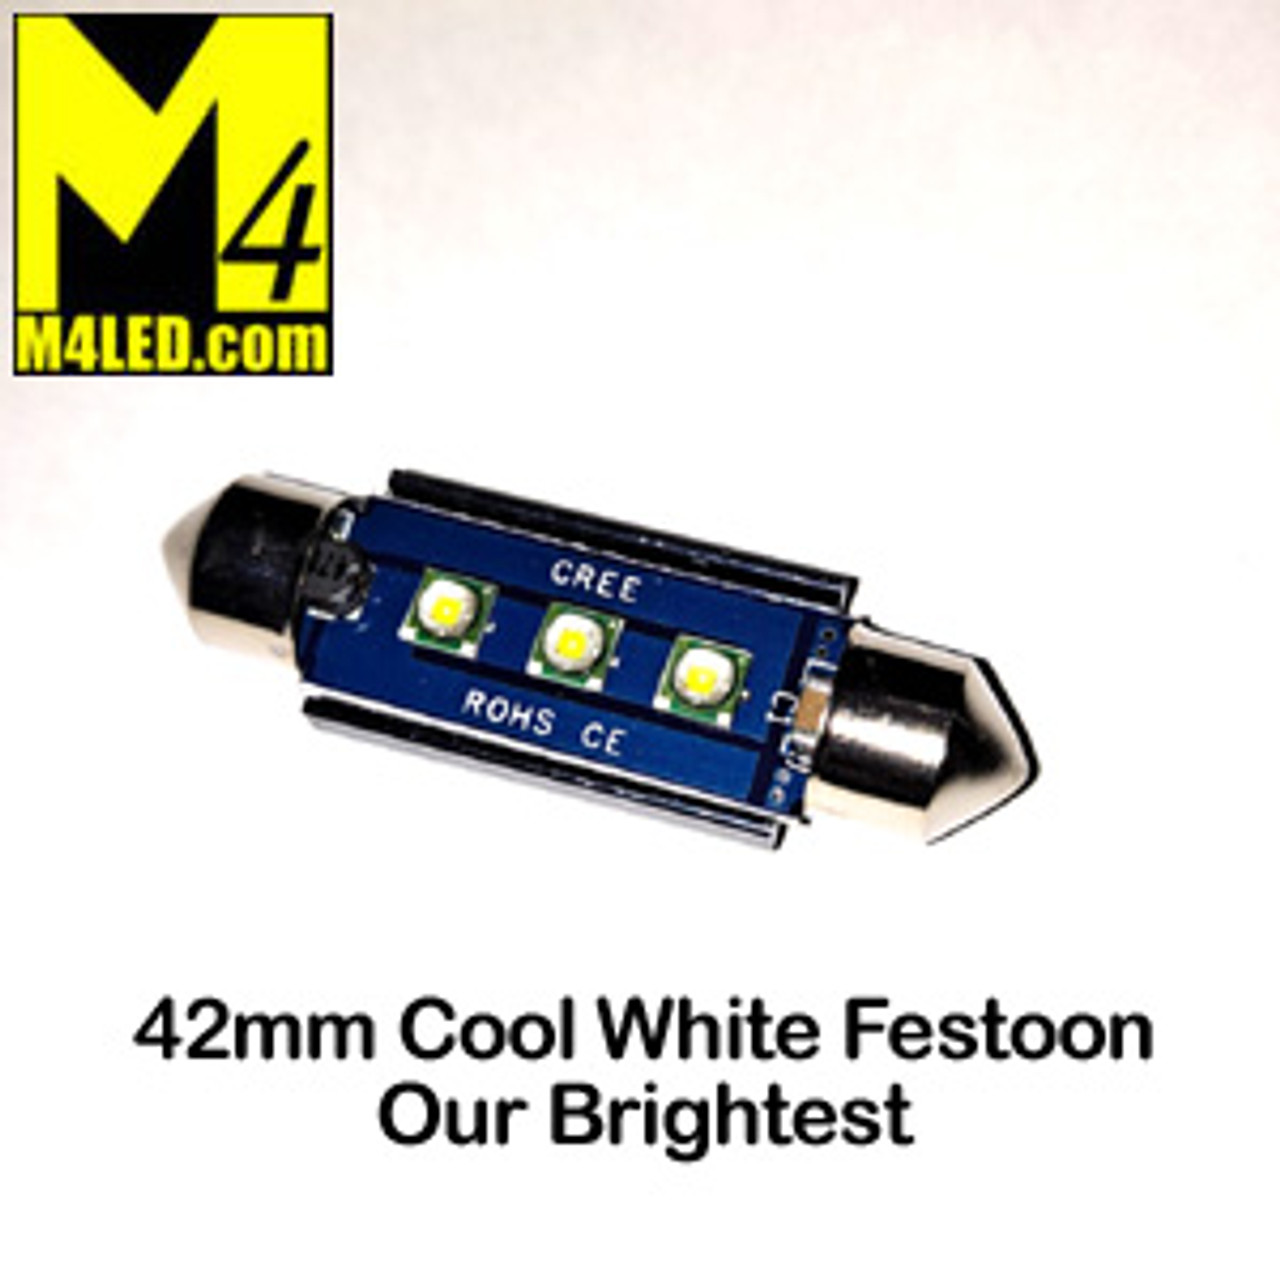 FESTOON-3-CREE-CW Brightest Cool White 42mm 211-2